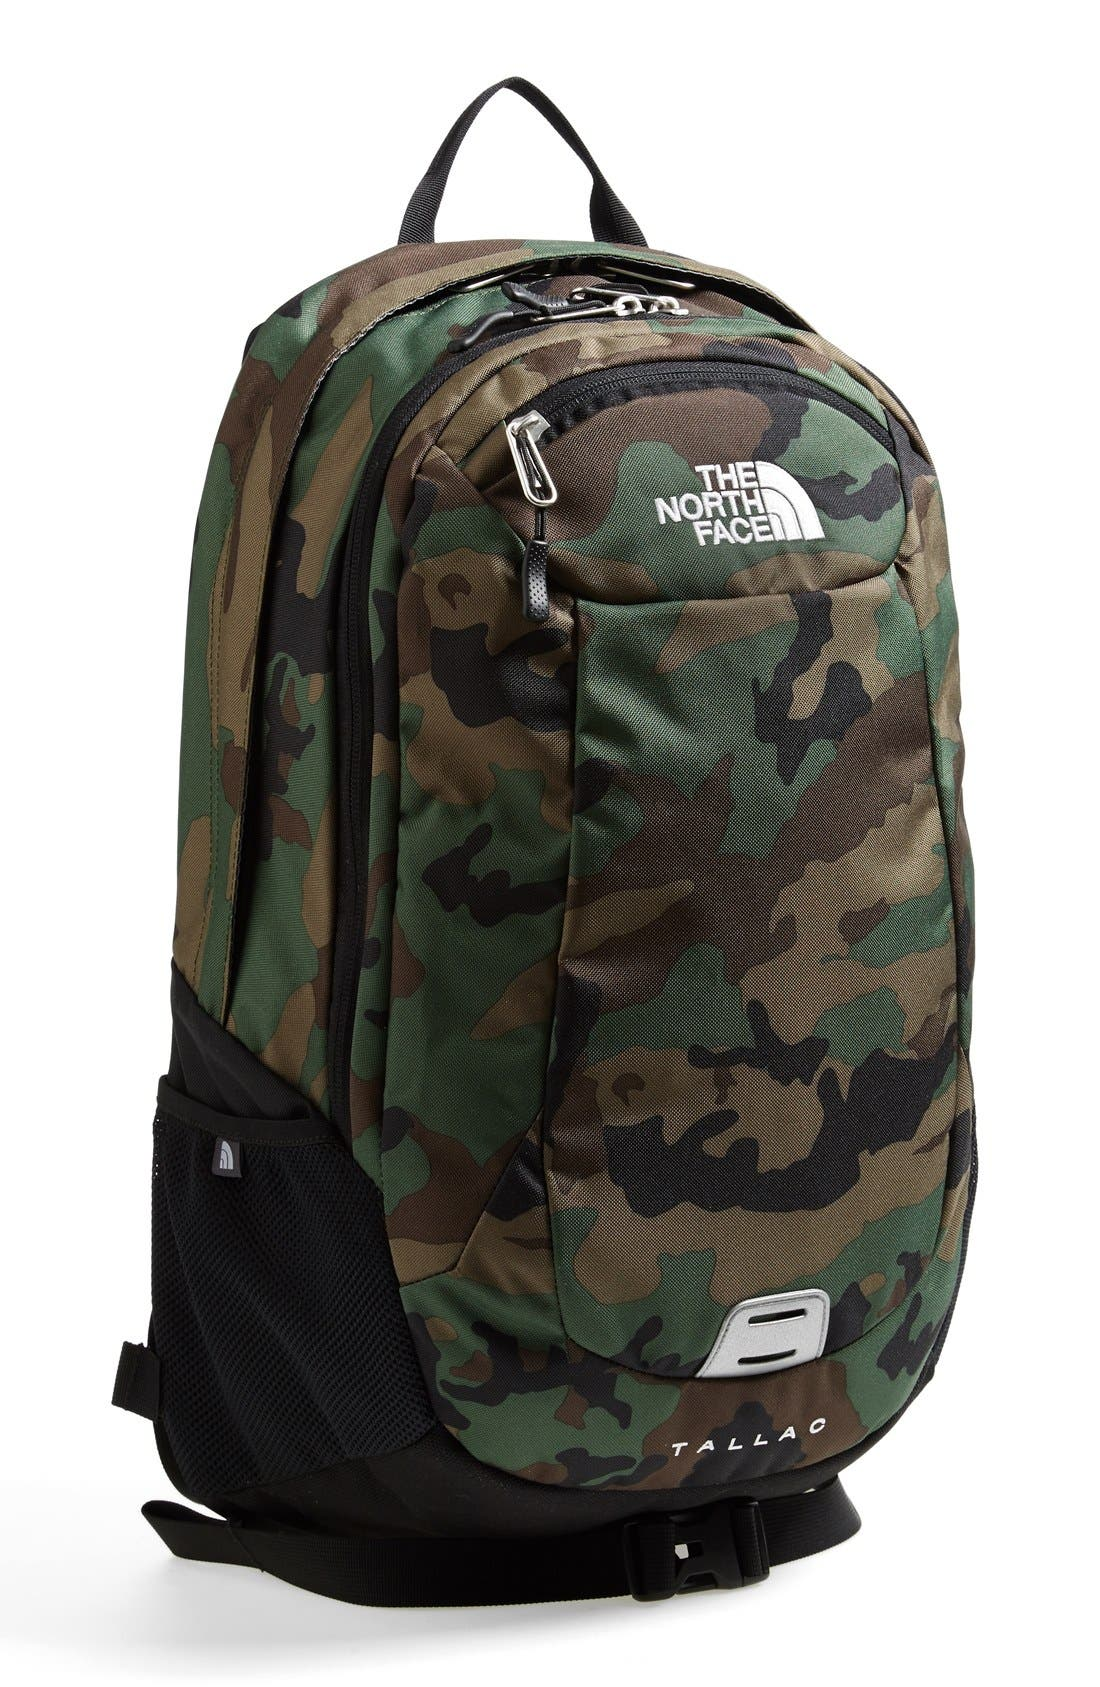 Main Image - The North Face 'Tallac' Backpack (Big Boys)